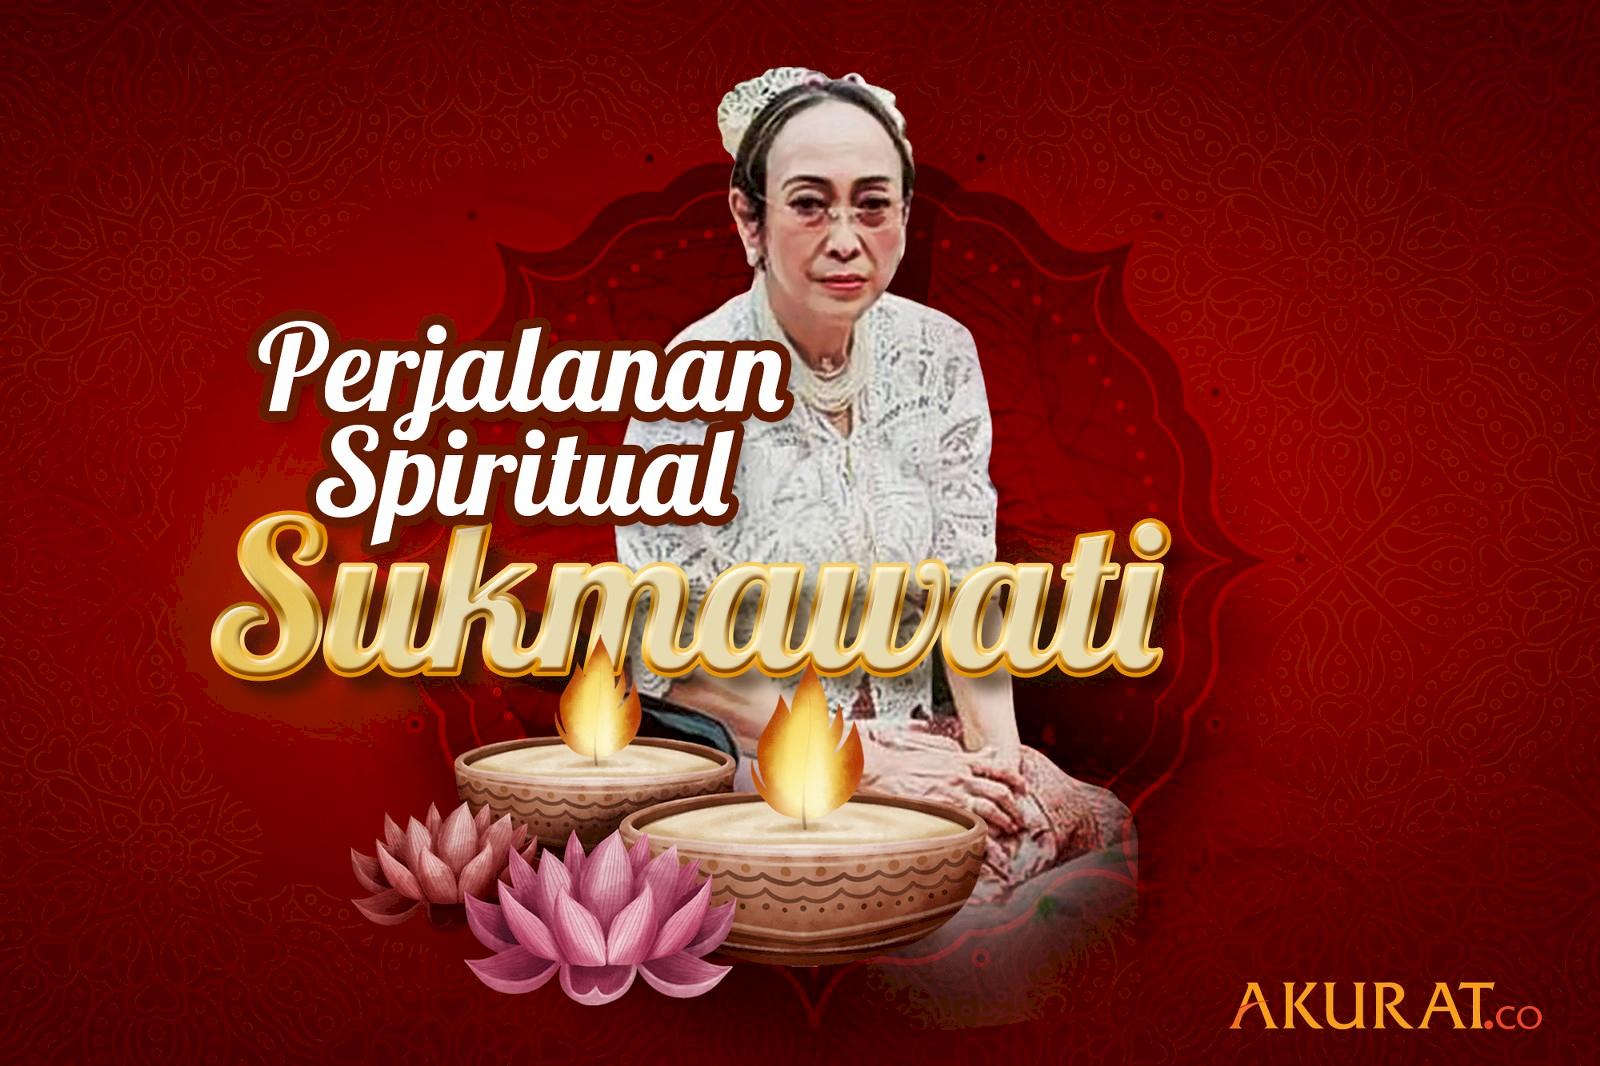 Perjalanan Spiritual Sukmawati